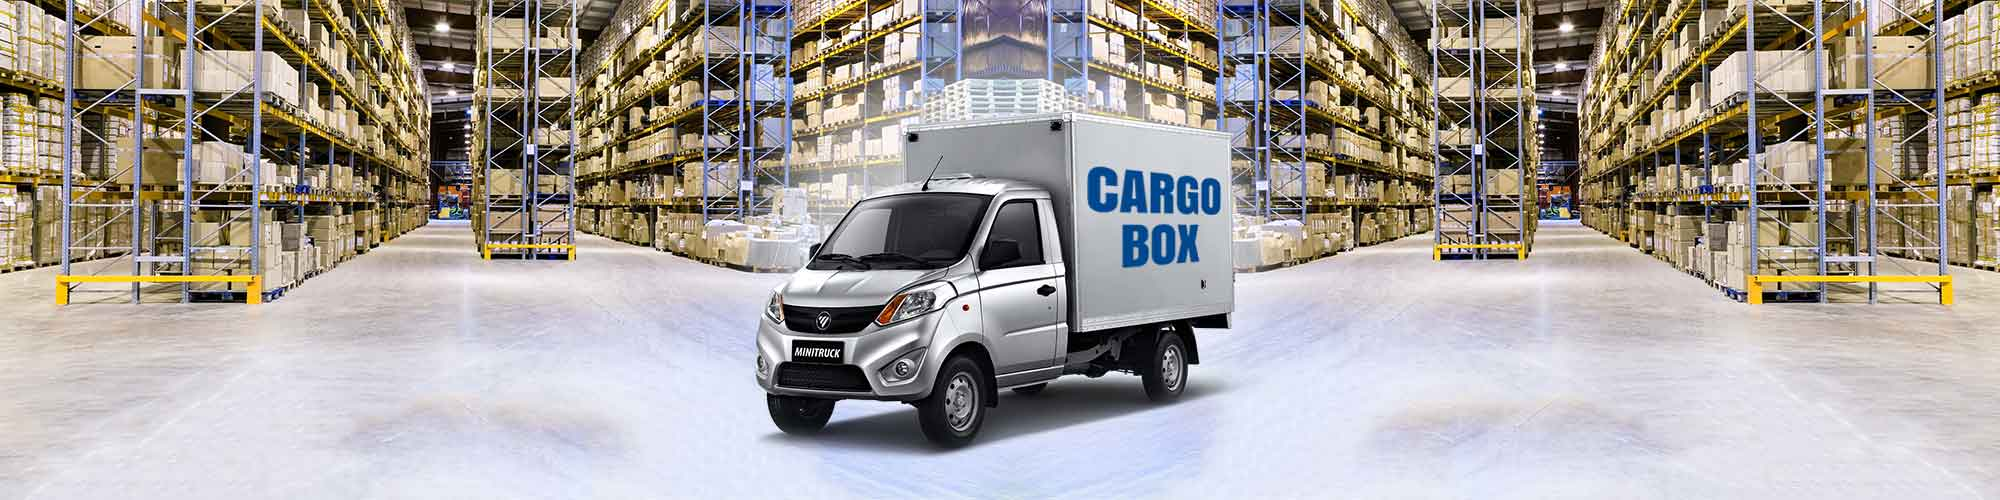 Gratour-Minitruk-Cargo-Box